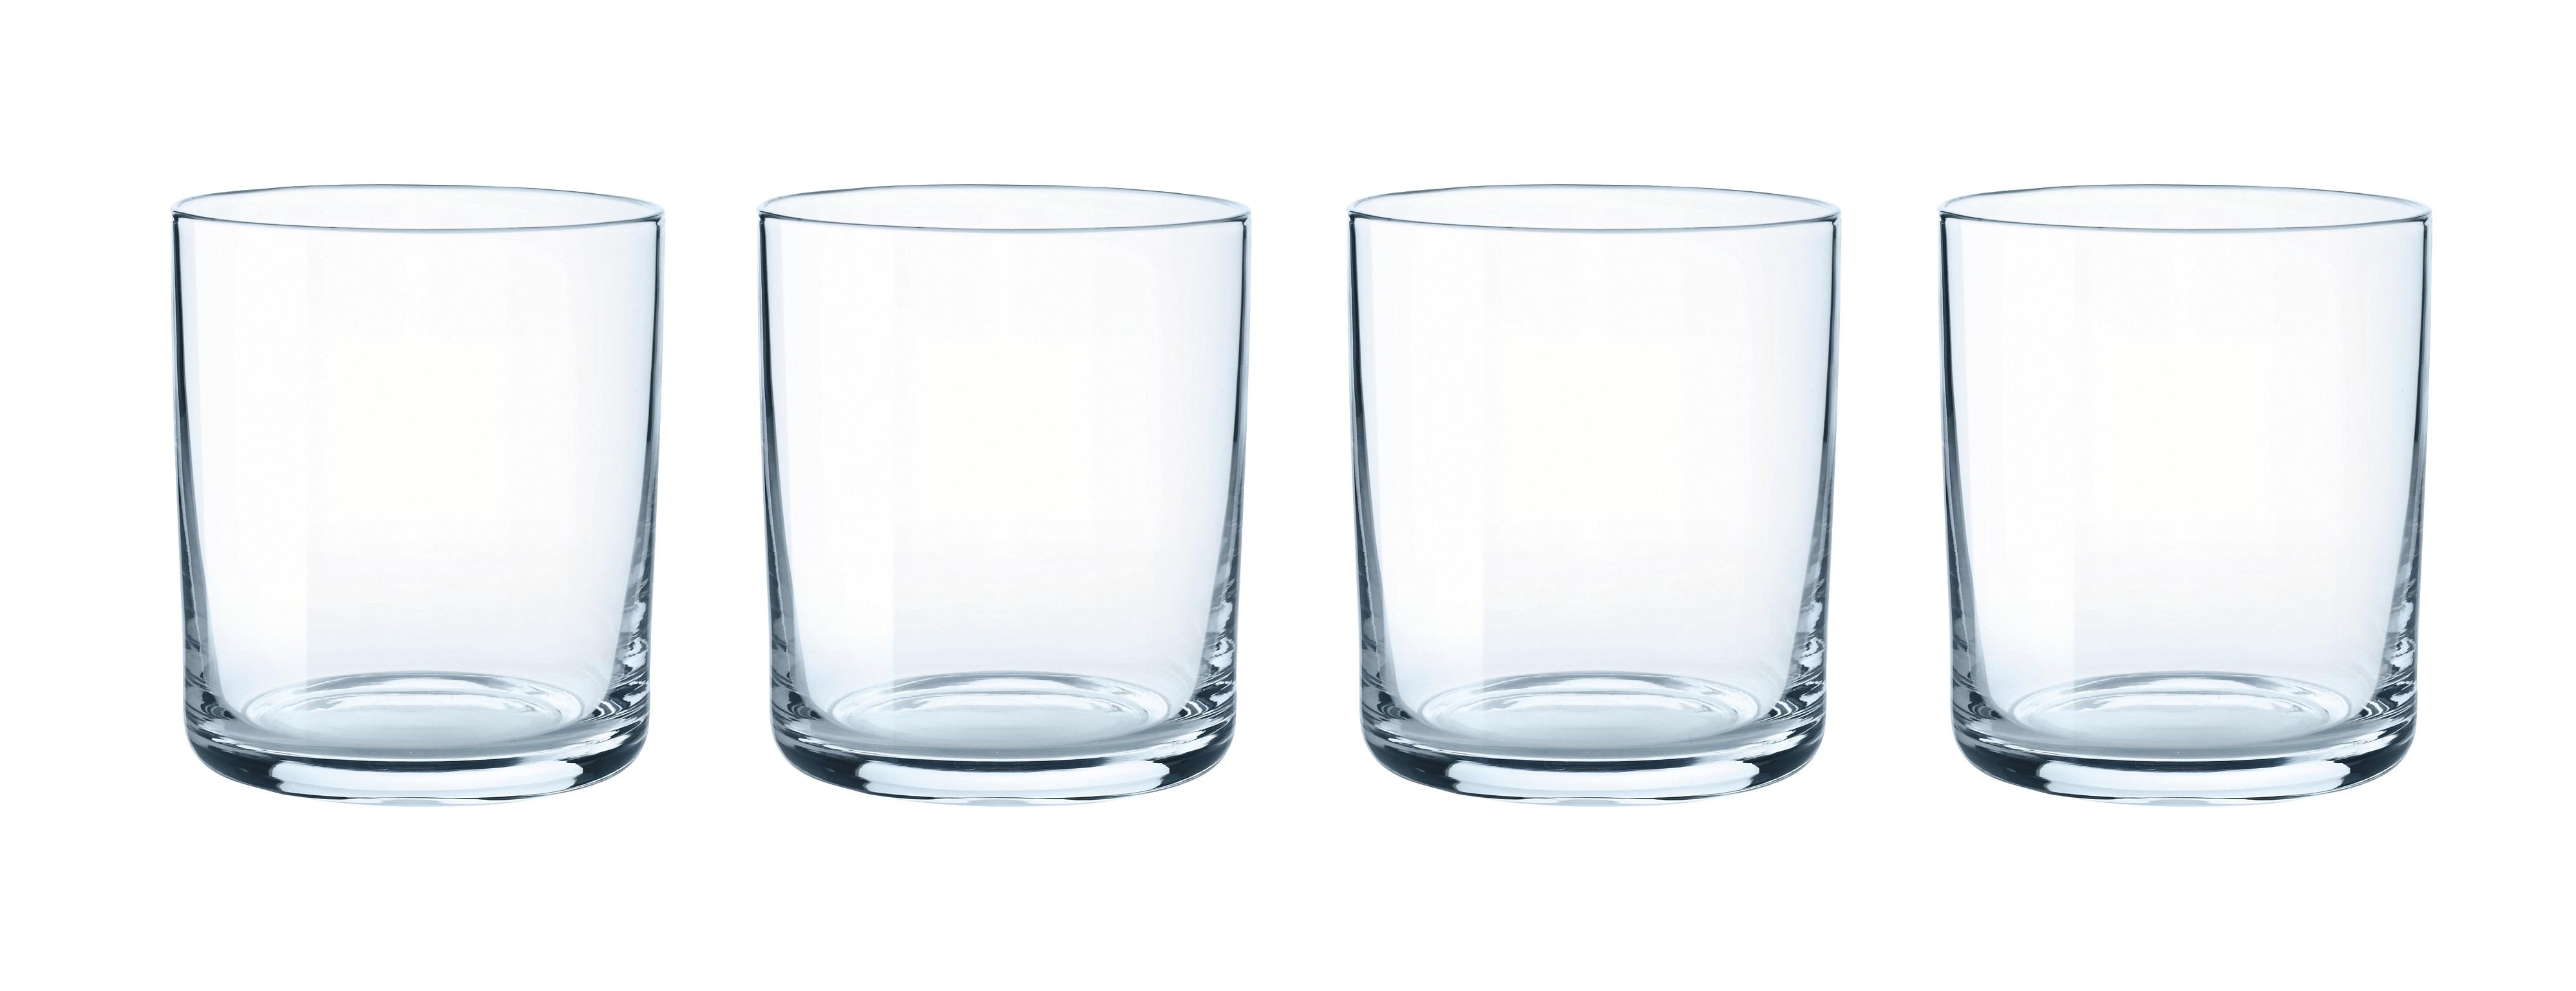 Набор бокалов Stelton Simply 701-2-1, прозрачный, 250 мл, 4 шт